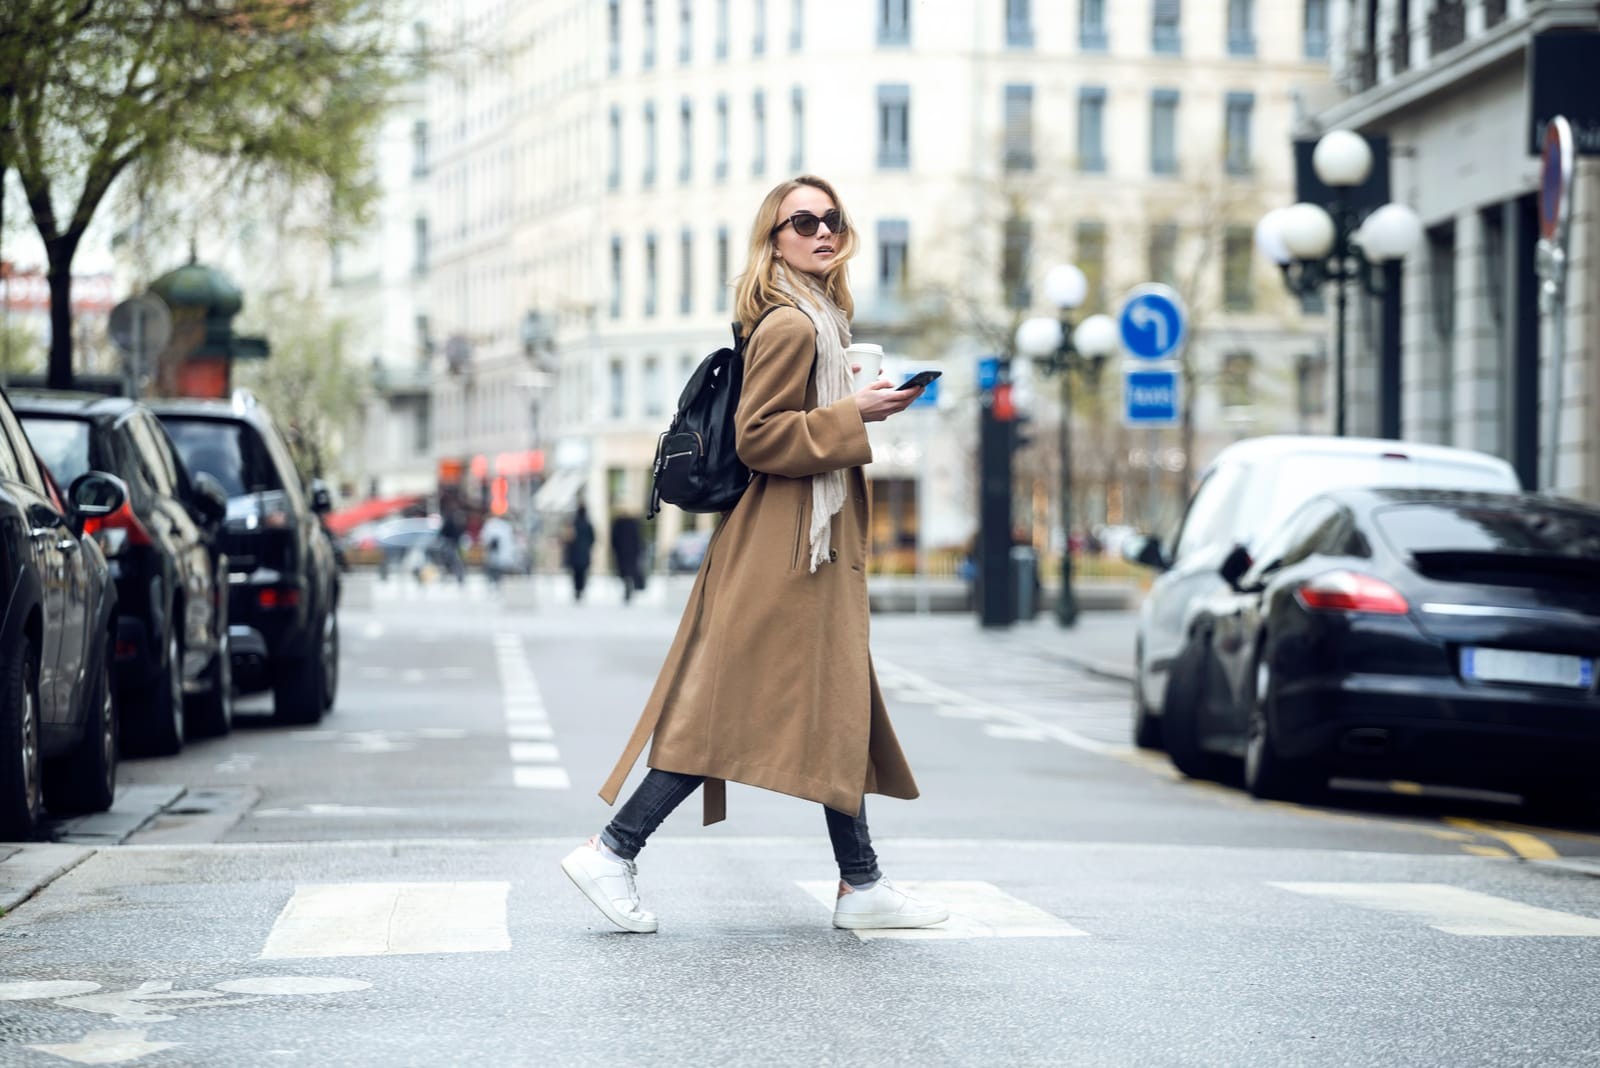 a woman walks down the street